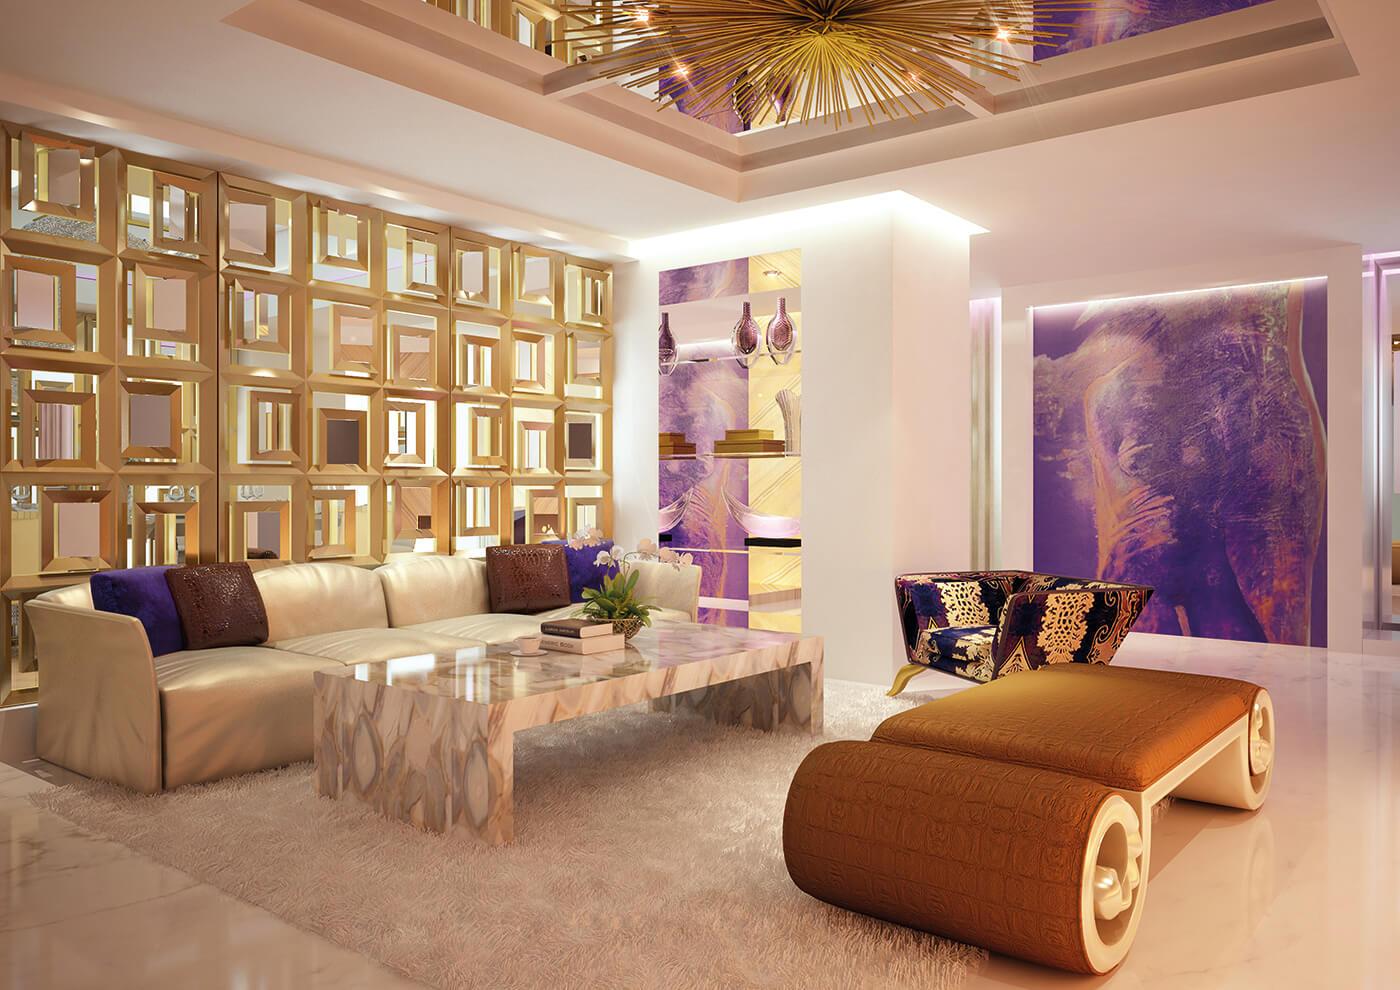 HE-Khadem-Paris-Apartment-Living-Room